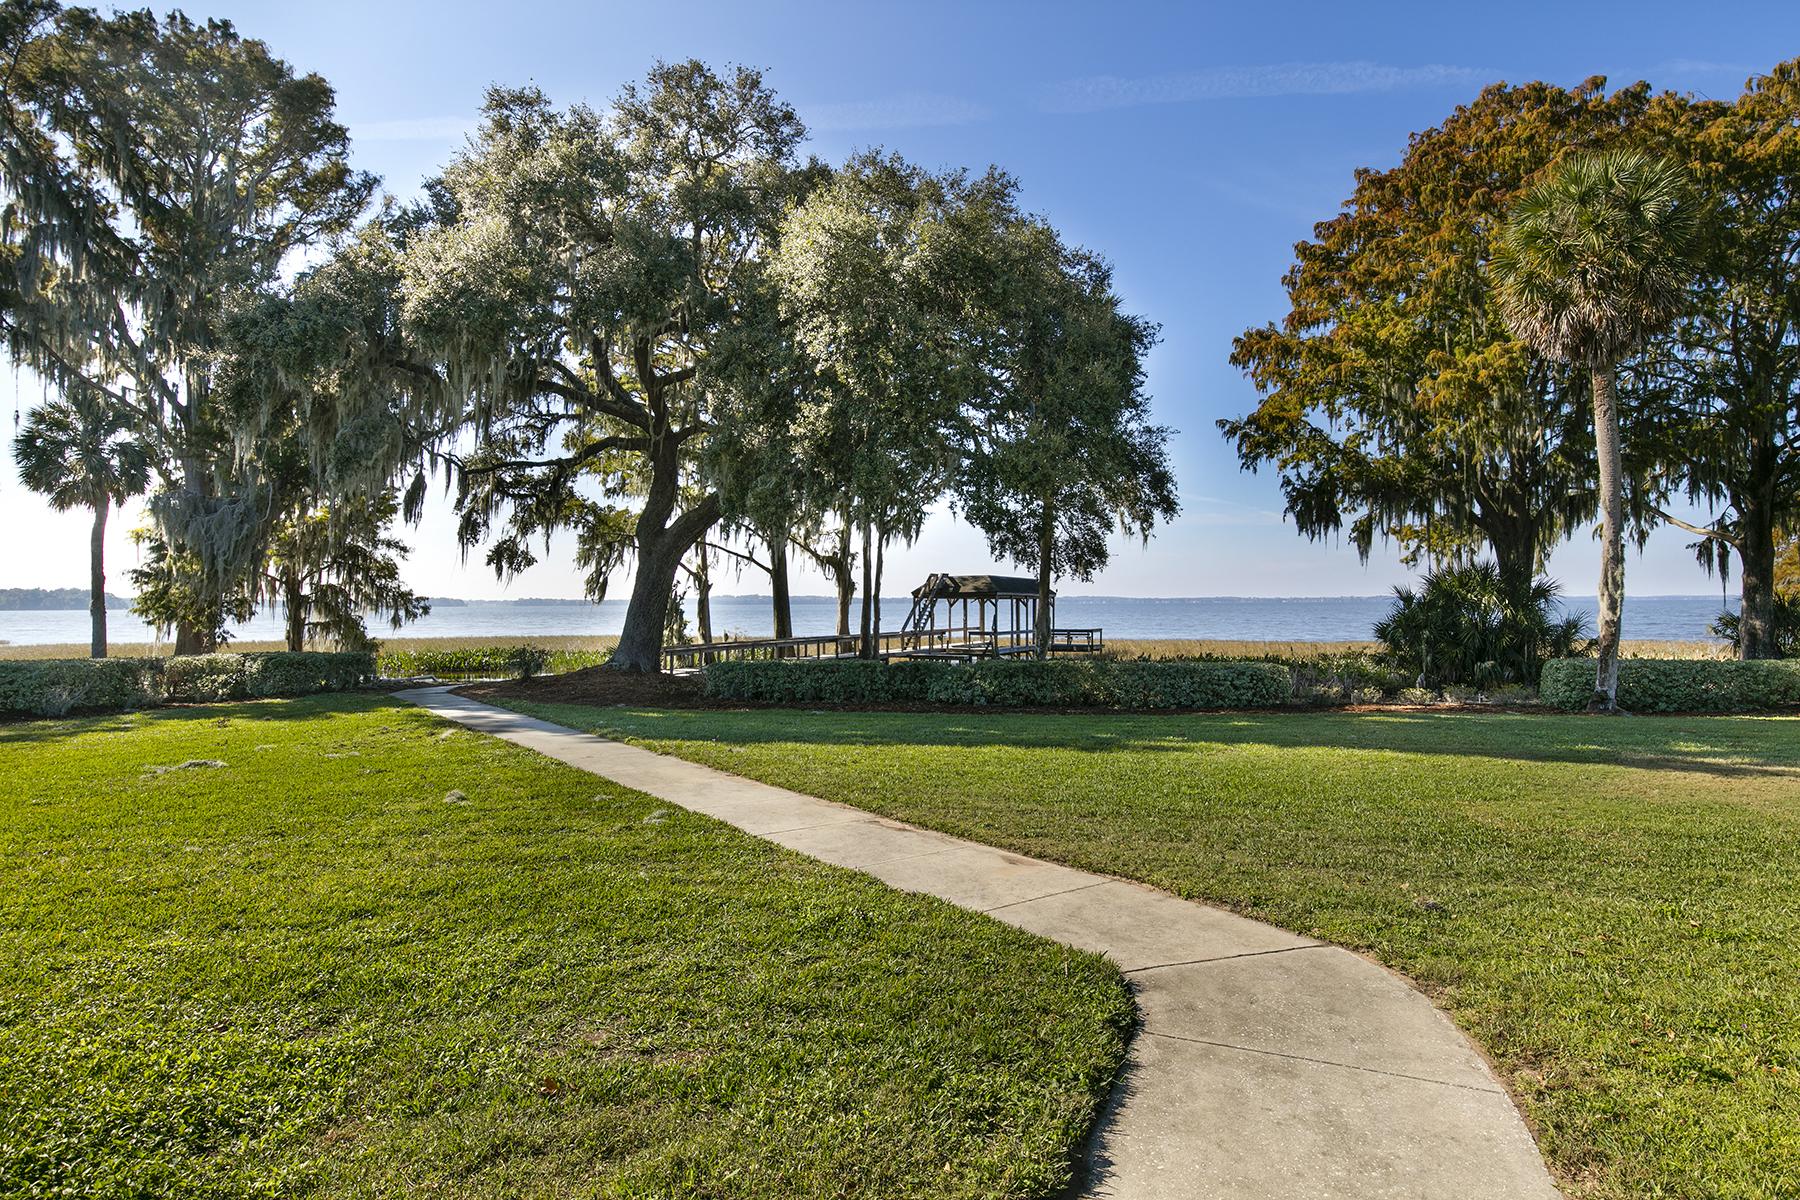 Additional photo for property listing at TAVARES  FLORIDA 11226  Lane Park Rd,  Tavares, Florida 32778 United States